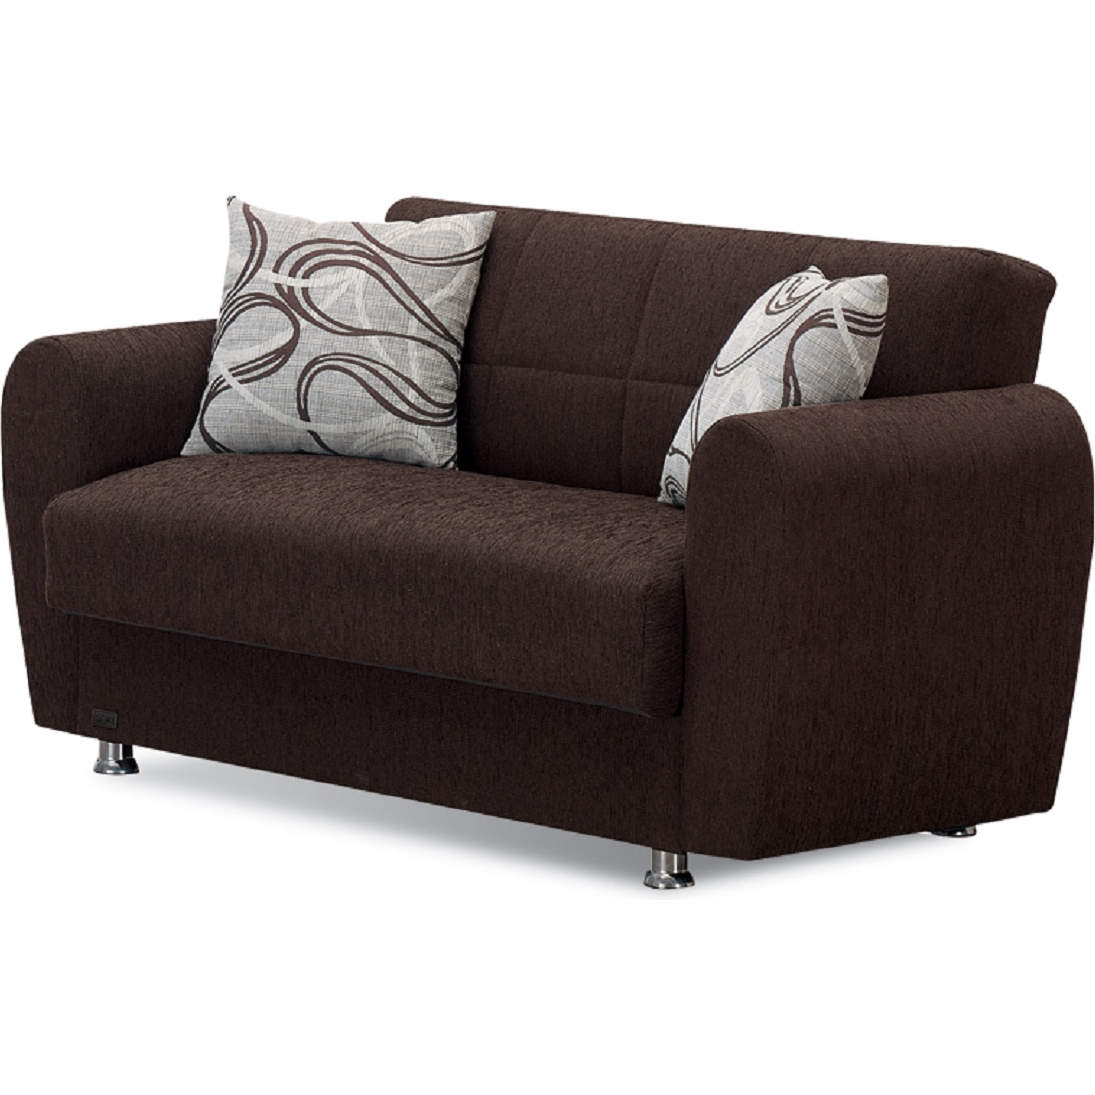 Boston Convertible Loveseat In Dark Brown Chenille By Empire Furniture